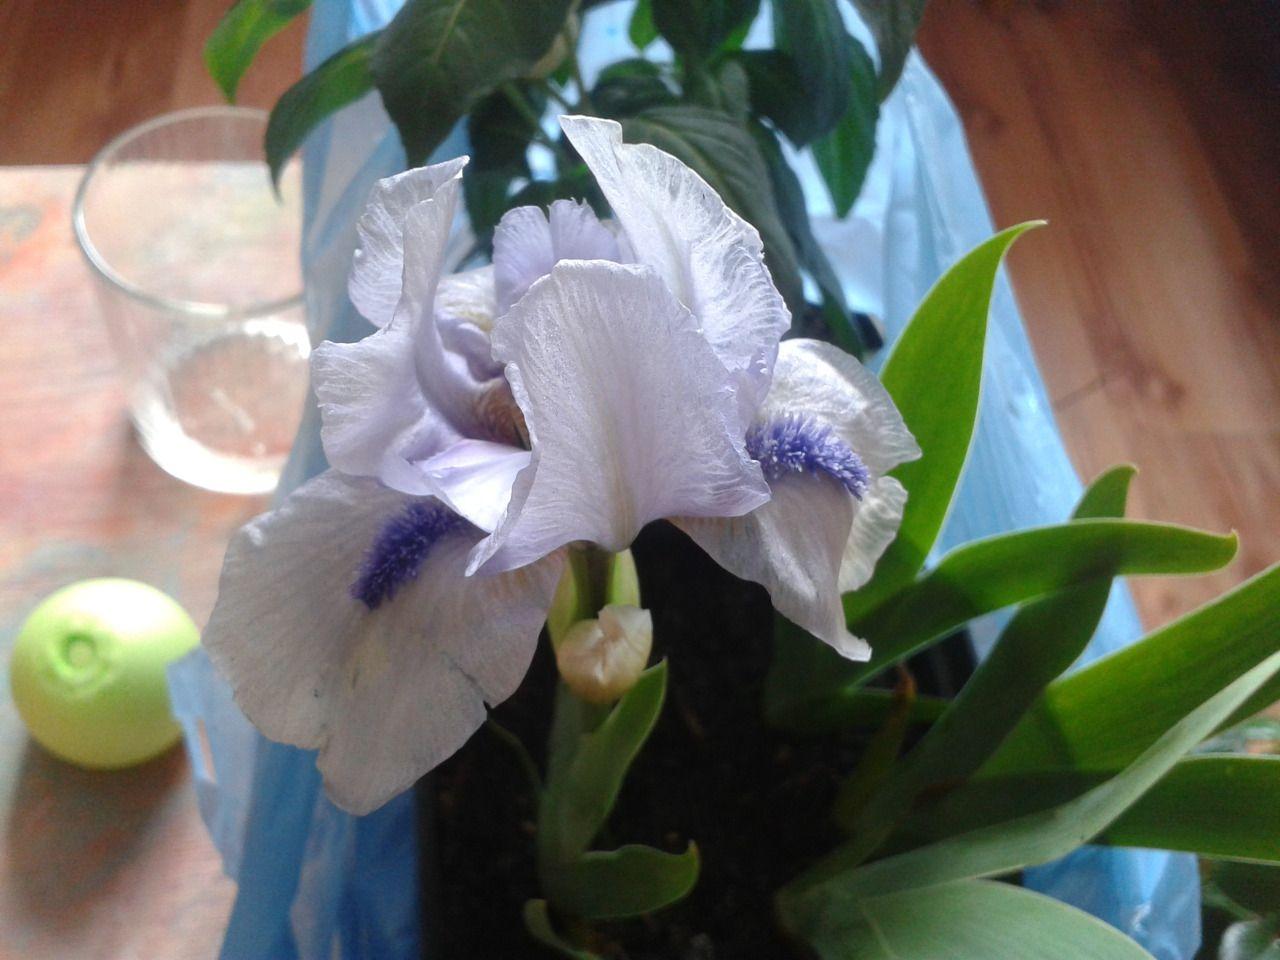 Iris Forever Blue SDB 1997 Chapman, 31 cm, E&R